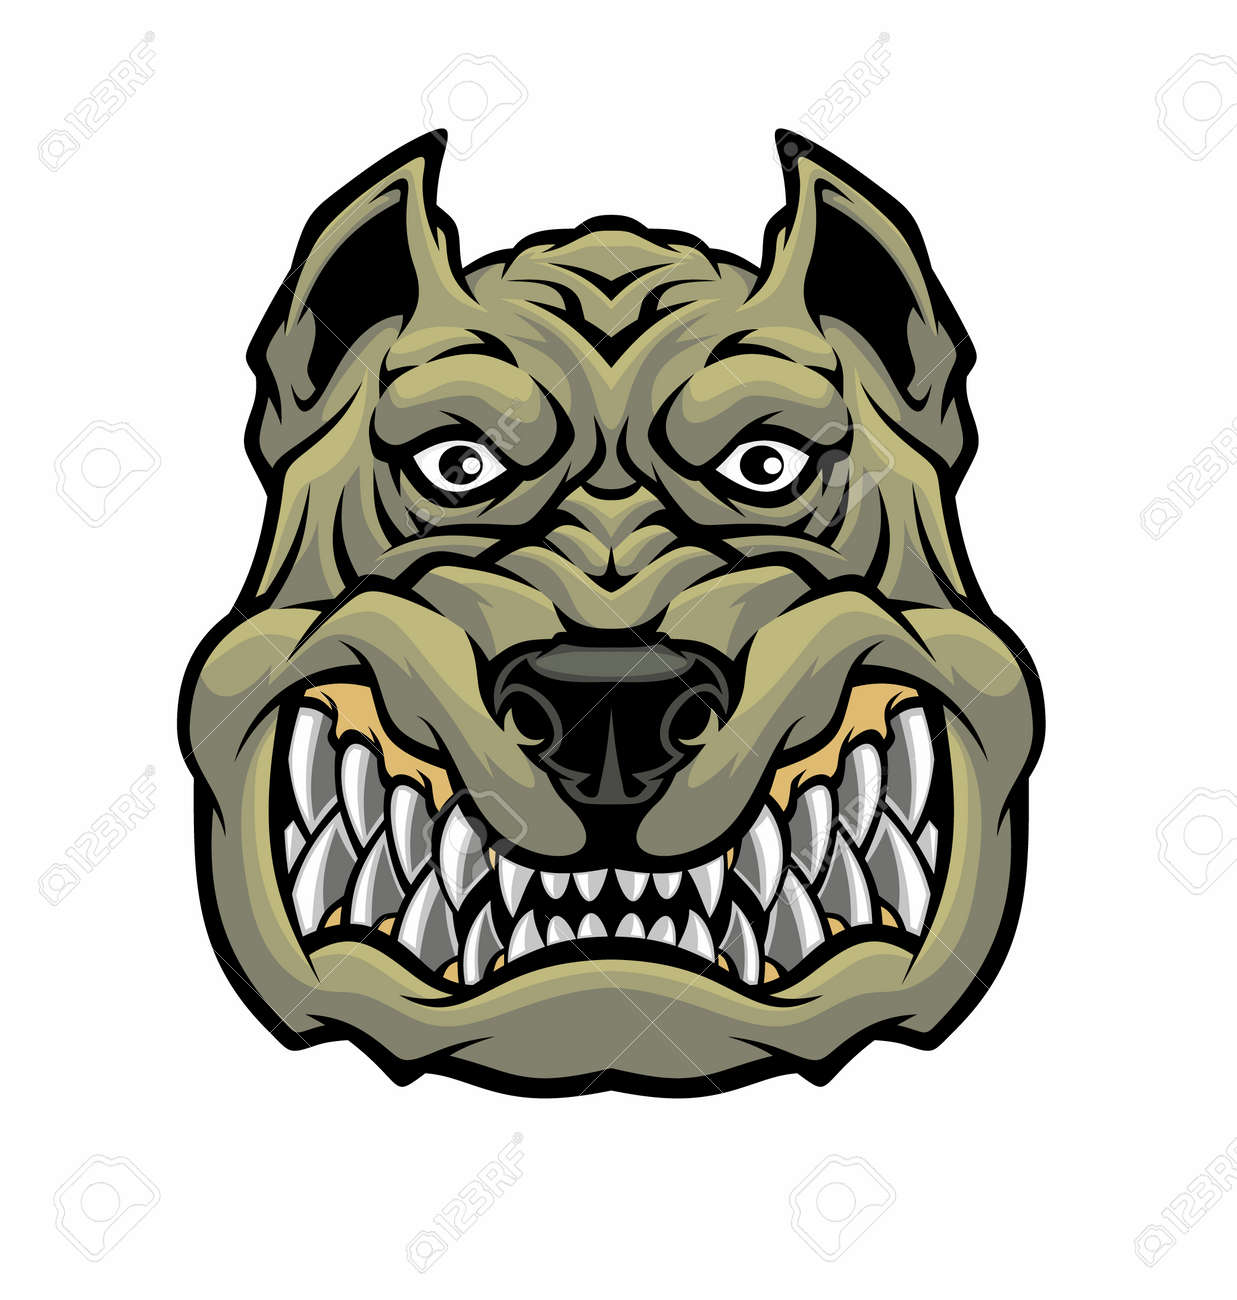 Angry pitbull head. - 167195320